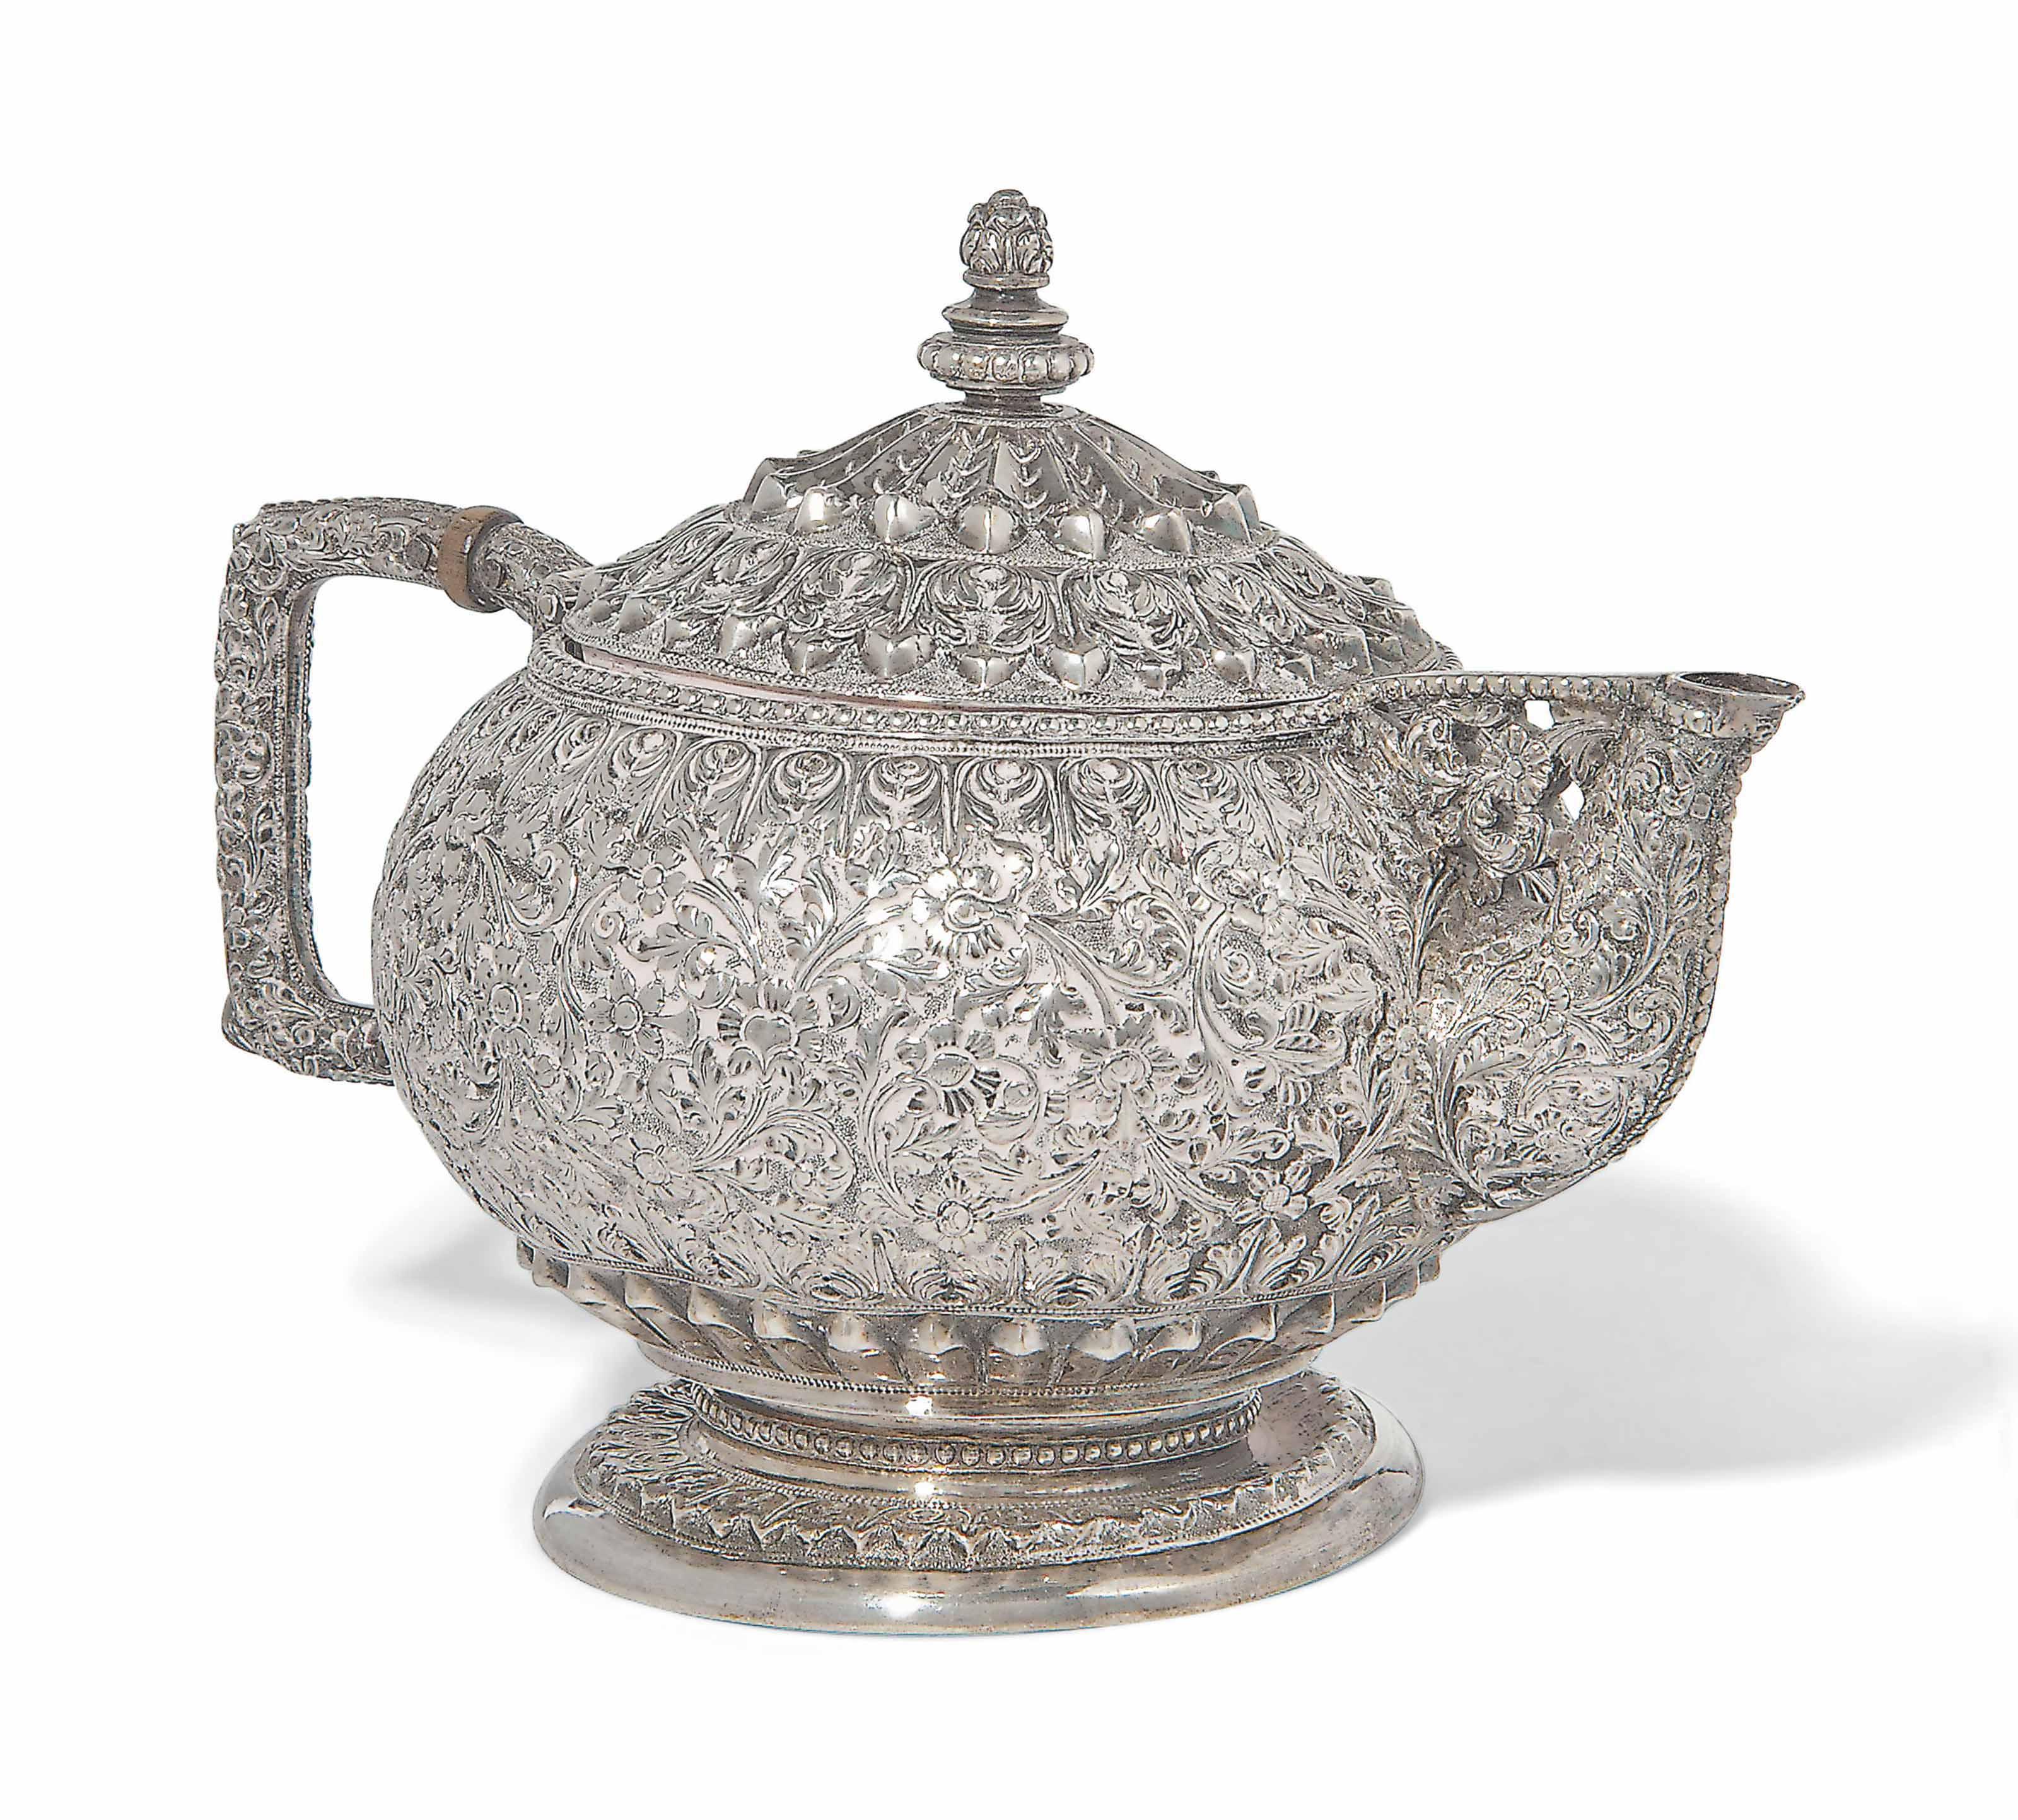 A SILVER REPOUSSÉ TEA POT